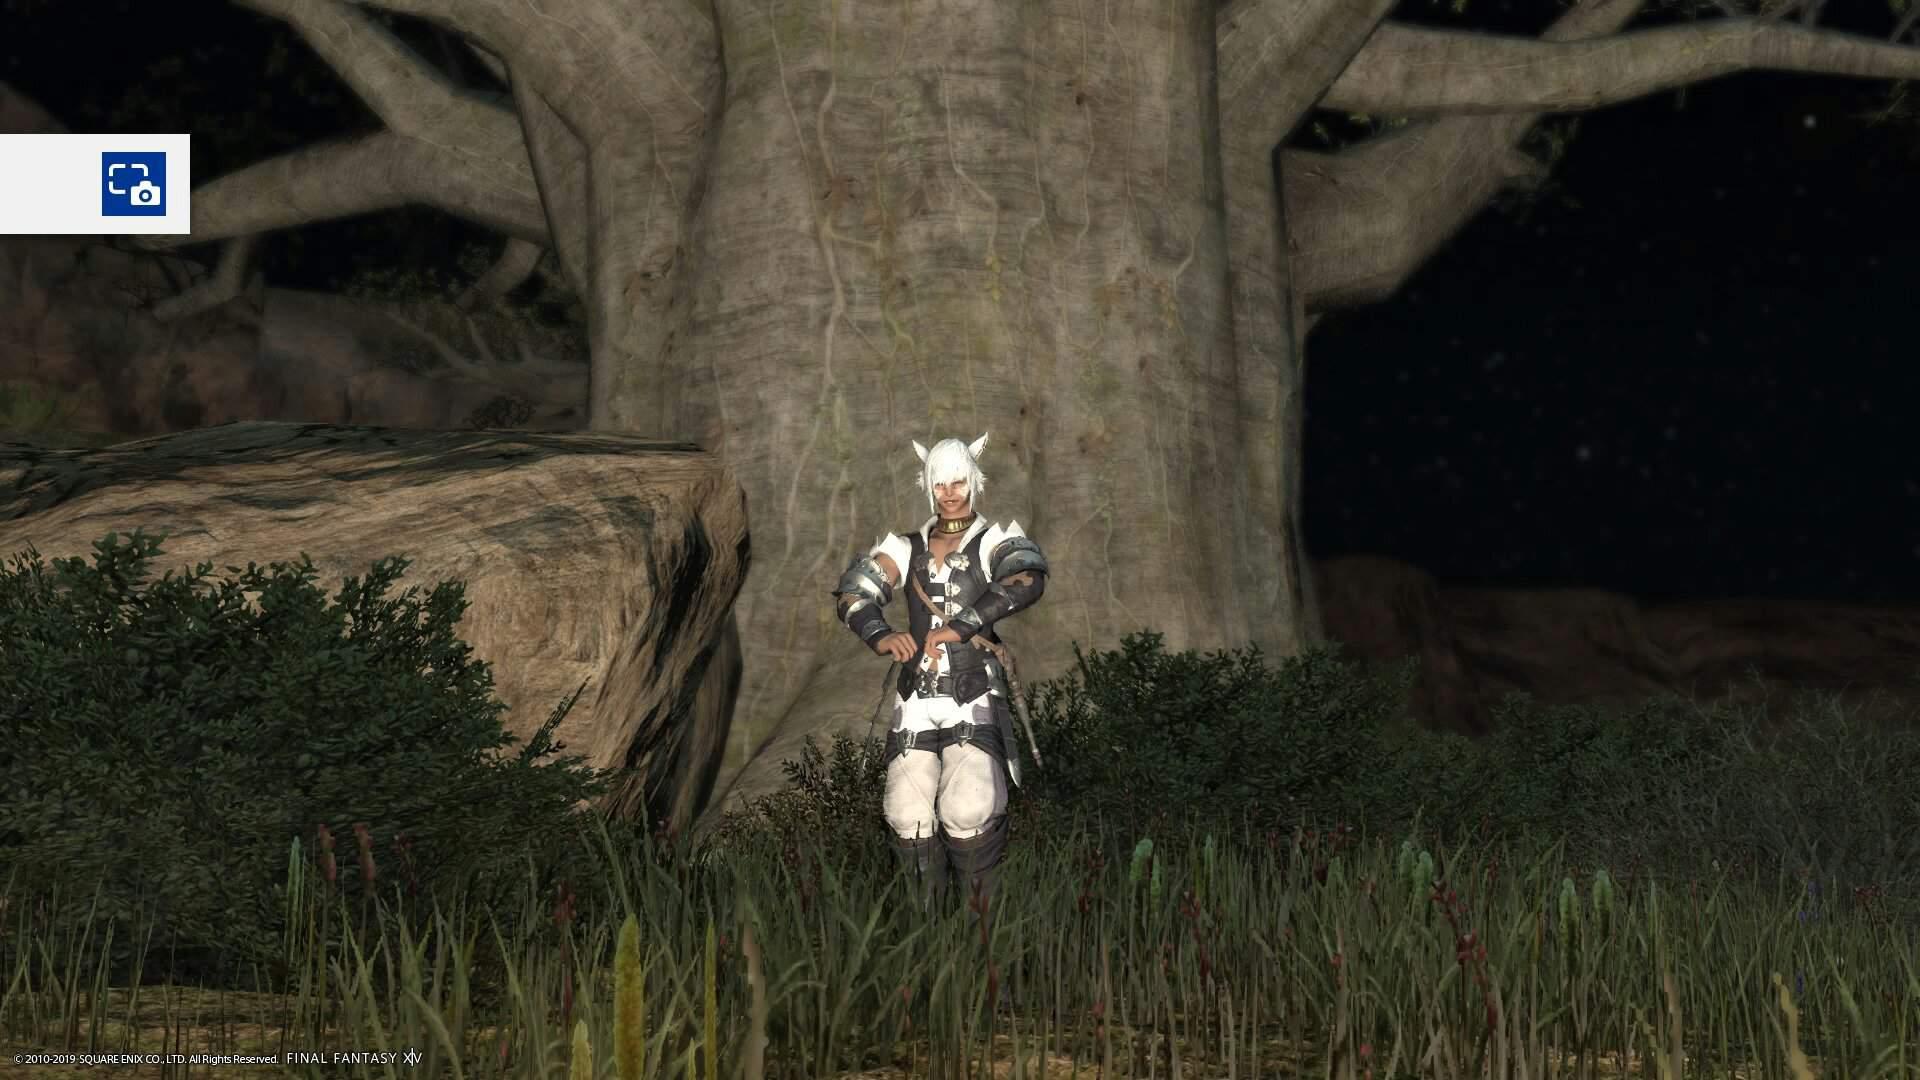 My new character his name is Jay Rena | Final Fantasy XIV